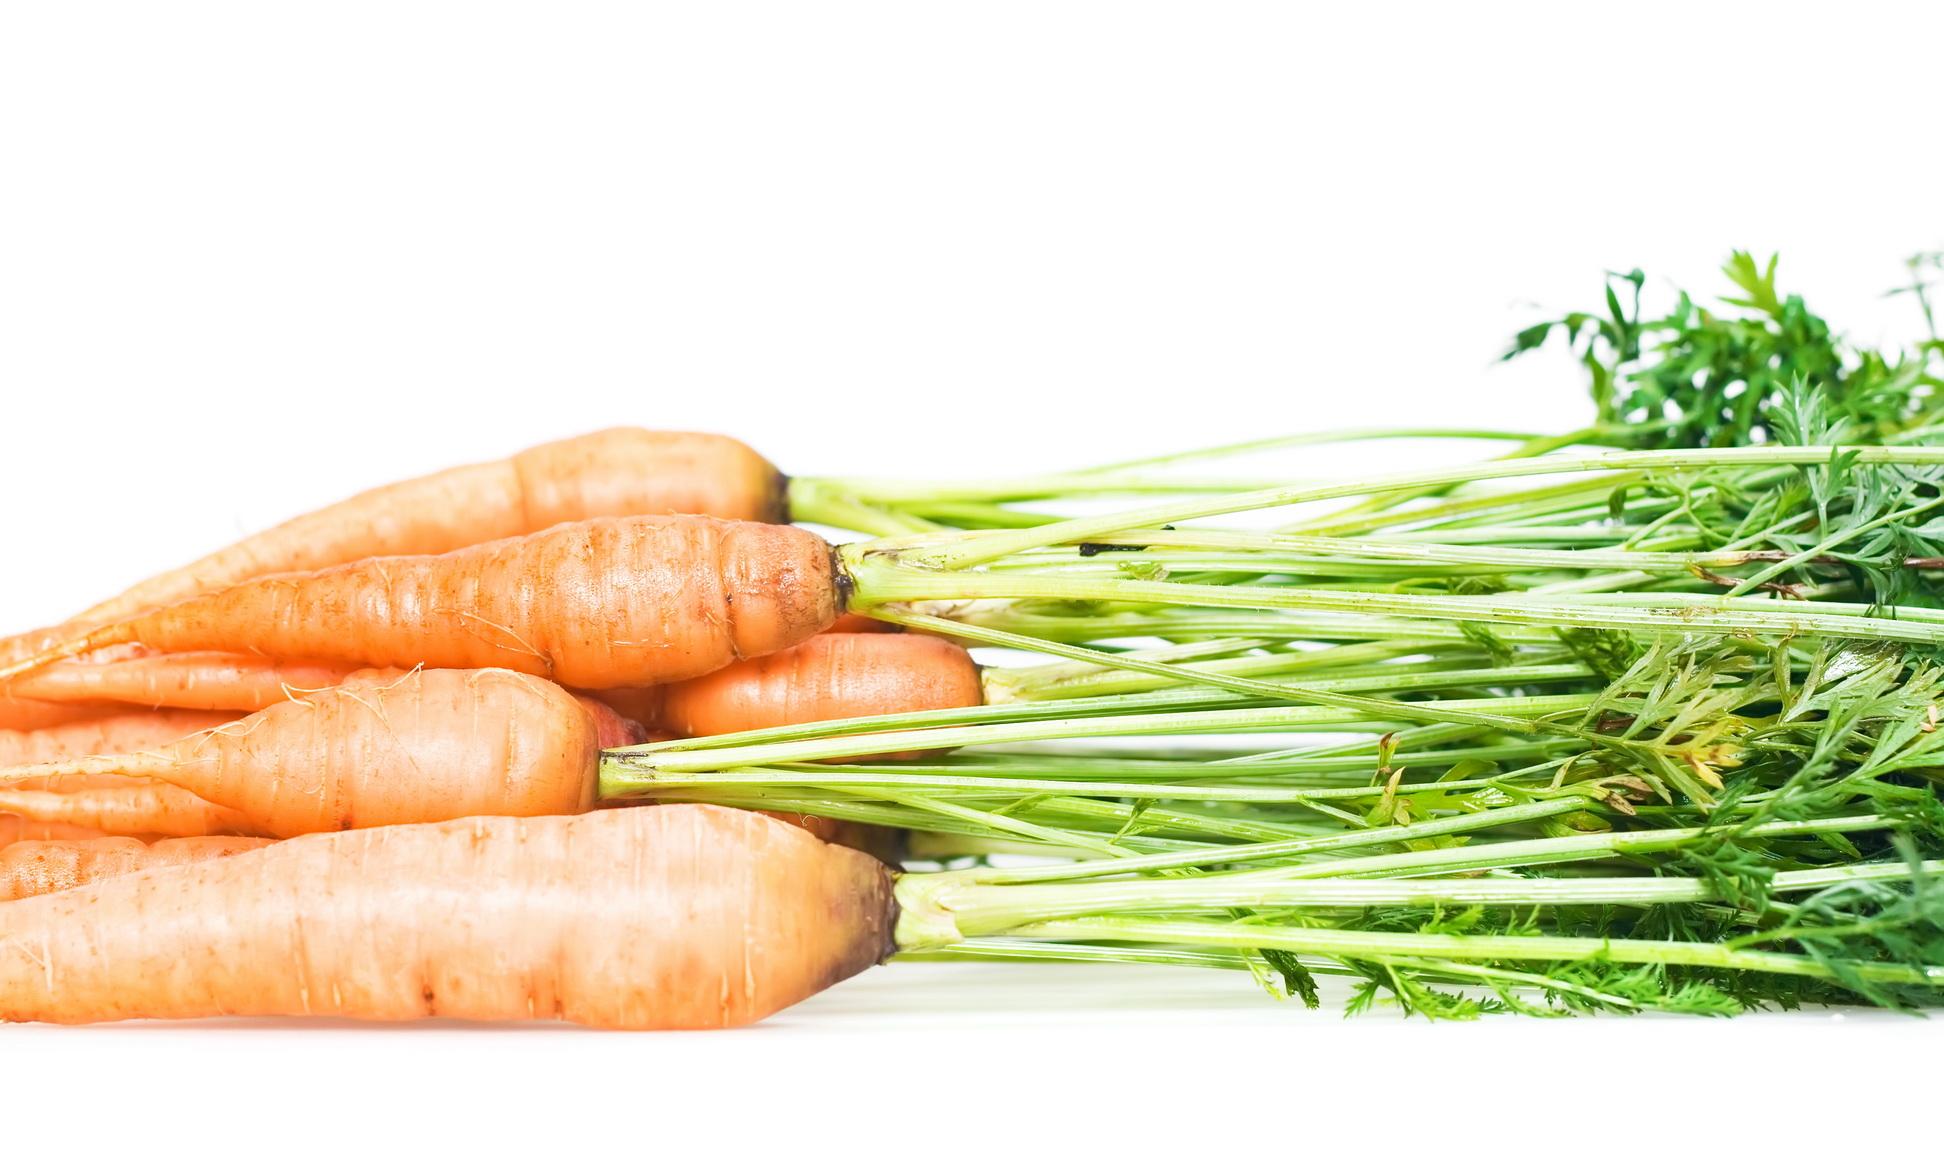 Carrot, Juicy, Refreshment, Raw, Organic, HQ Photo